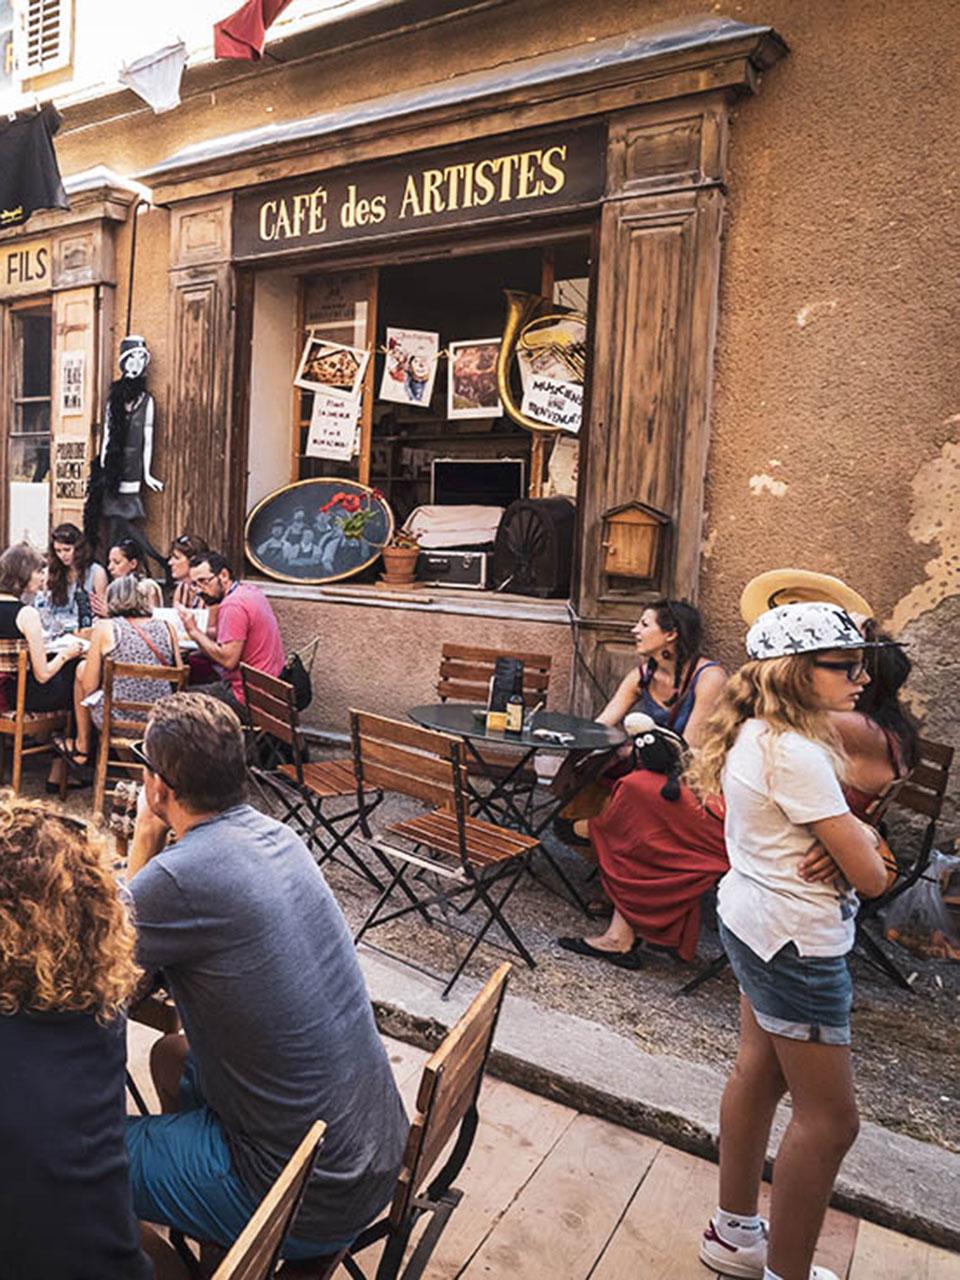 cafe-des-artistes-2-alpcat-medias-web3-224009-224687